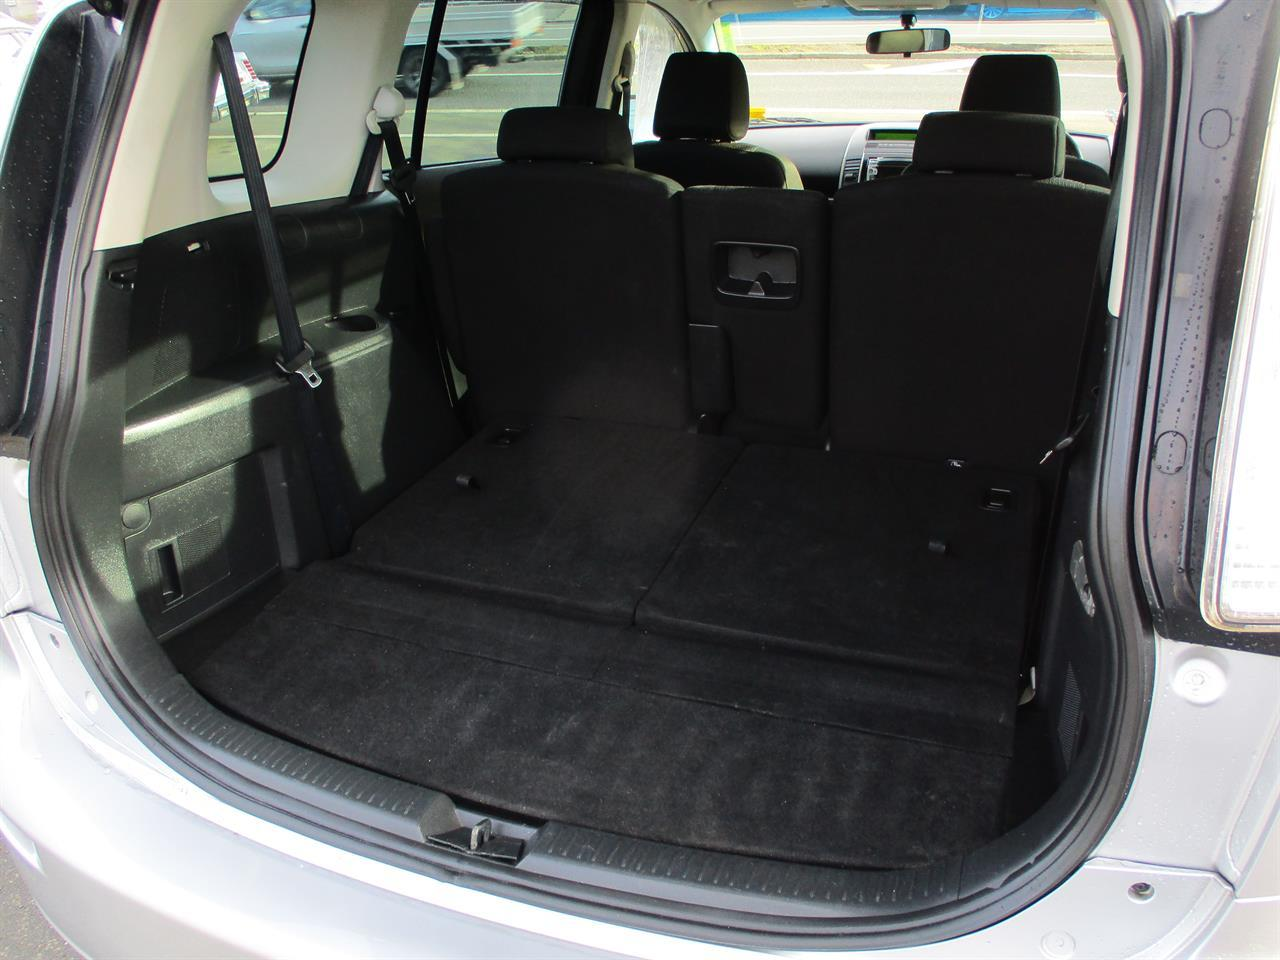 image-10, 2010 Mazda Premacy Seven Seater at Dunedin